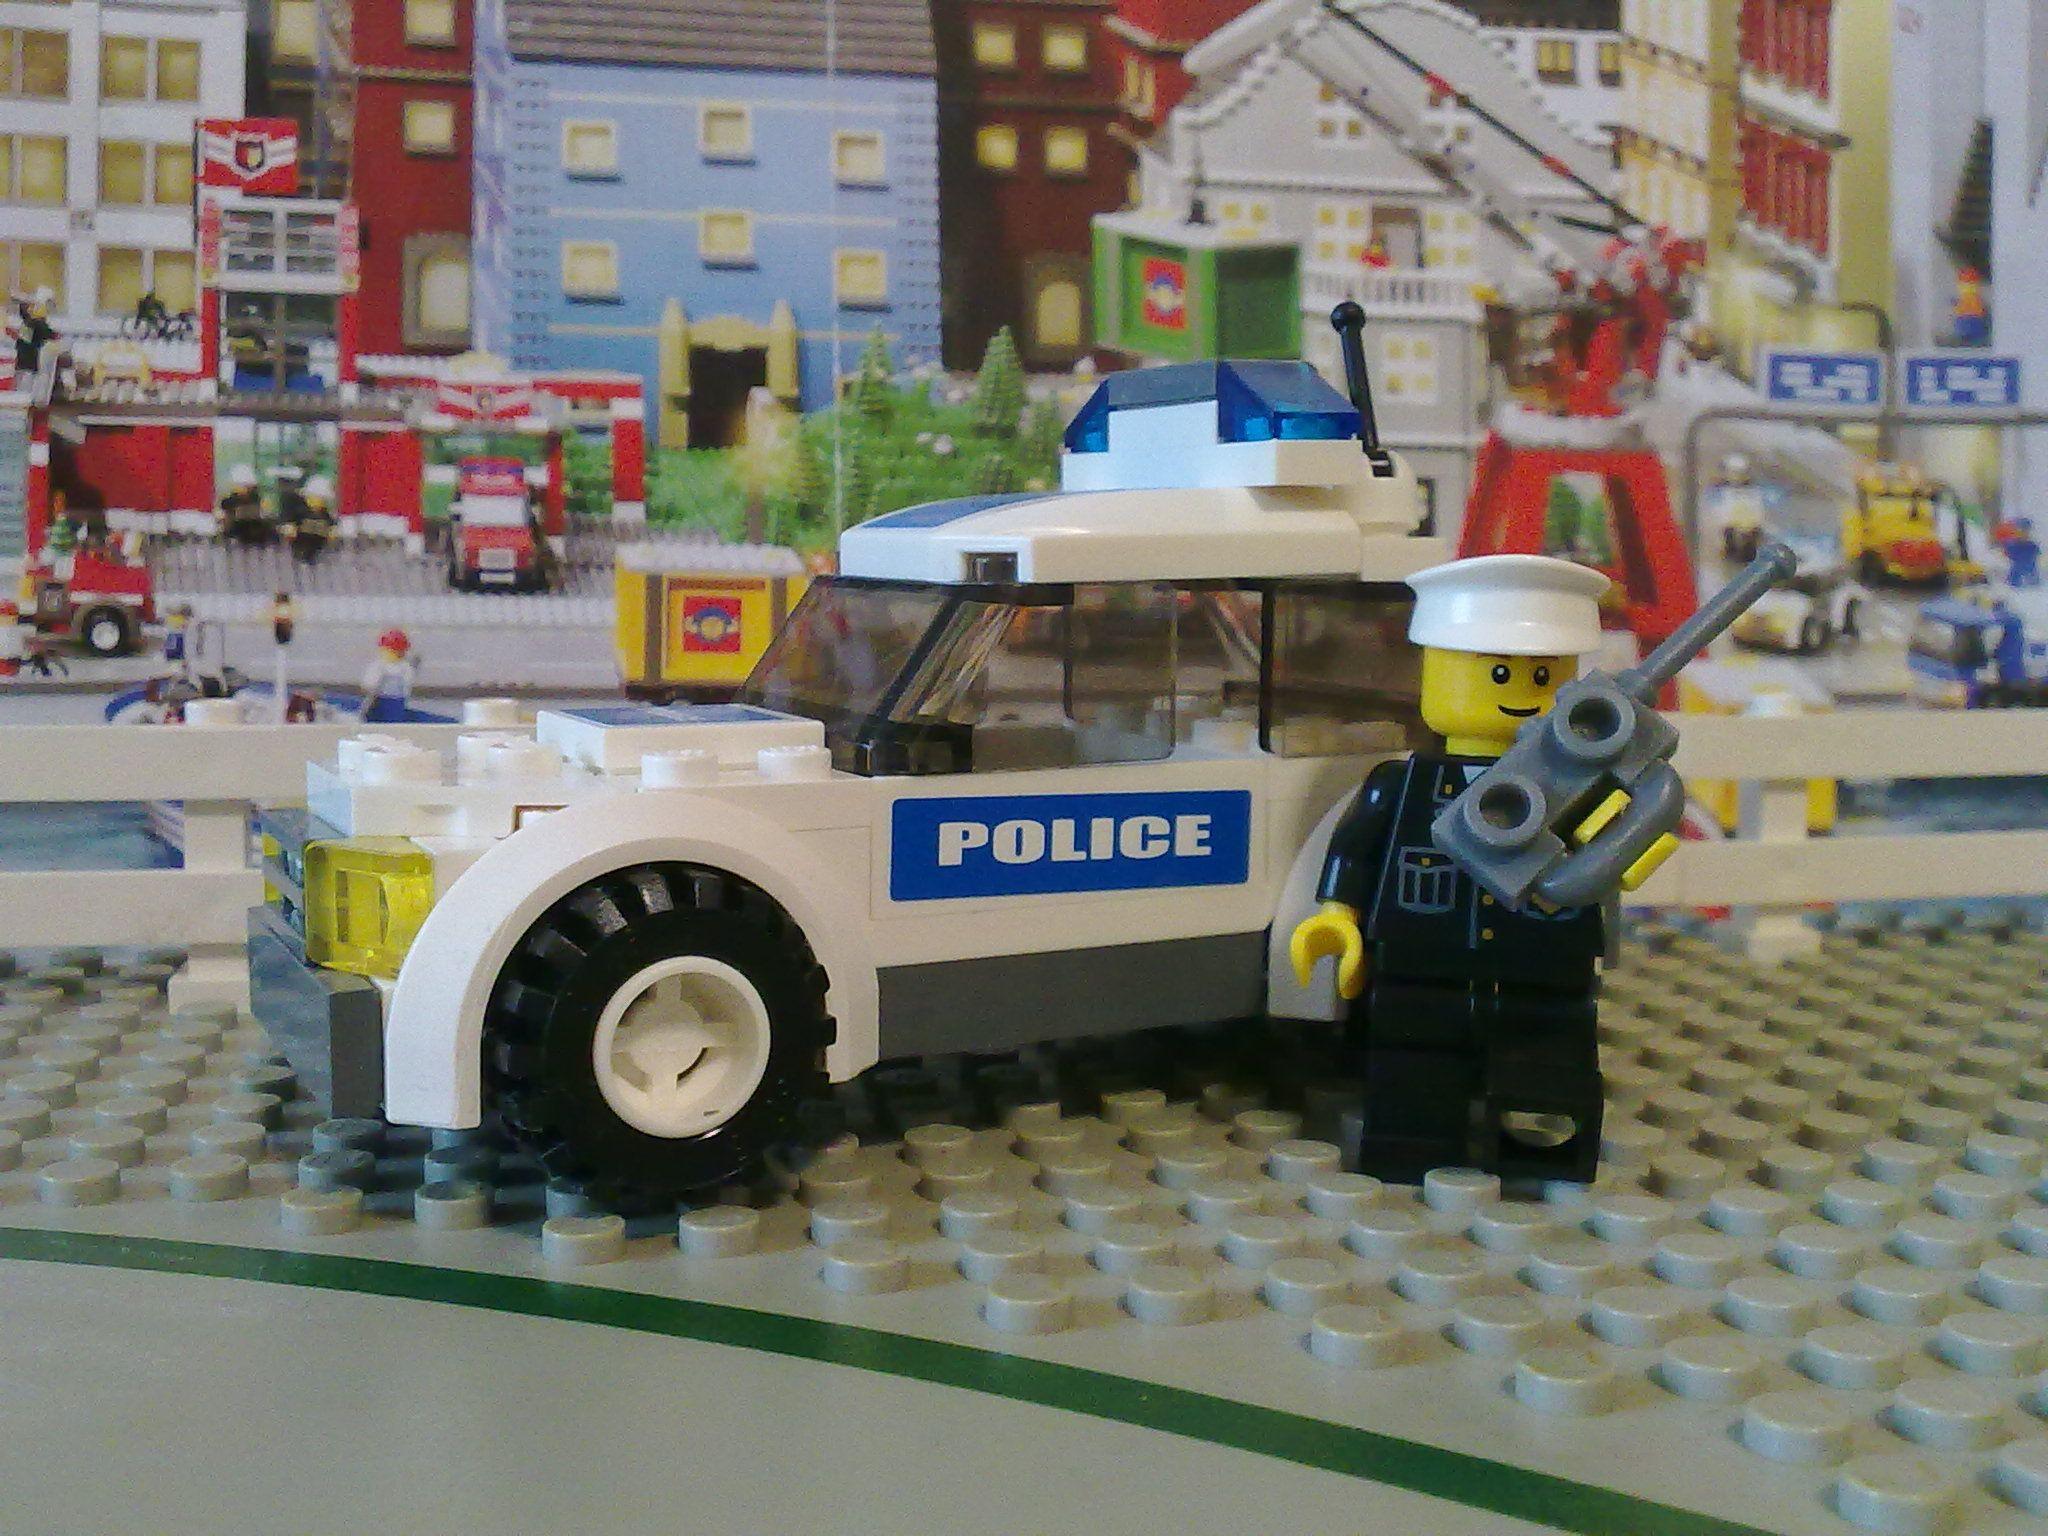 Lego 7236 1 Police Car 2005 Toy Car Police Cars Monster Trucks